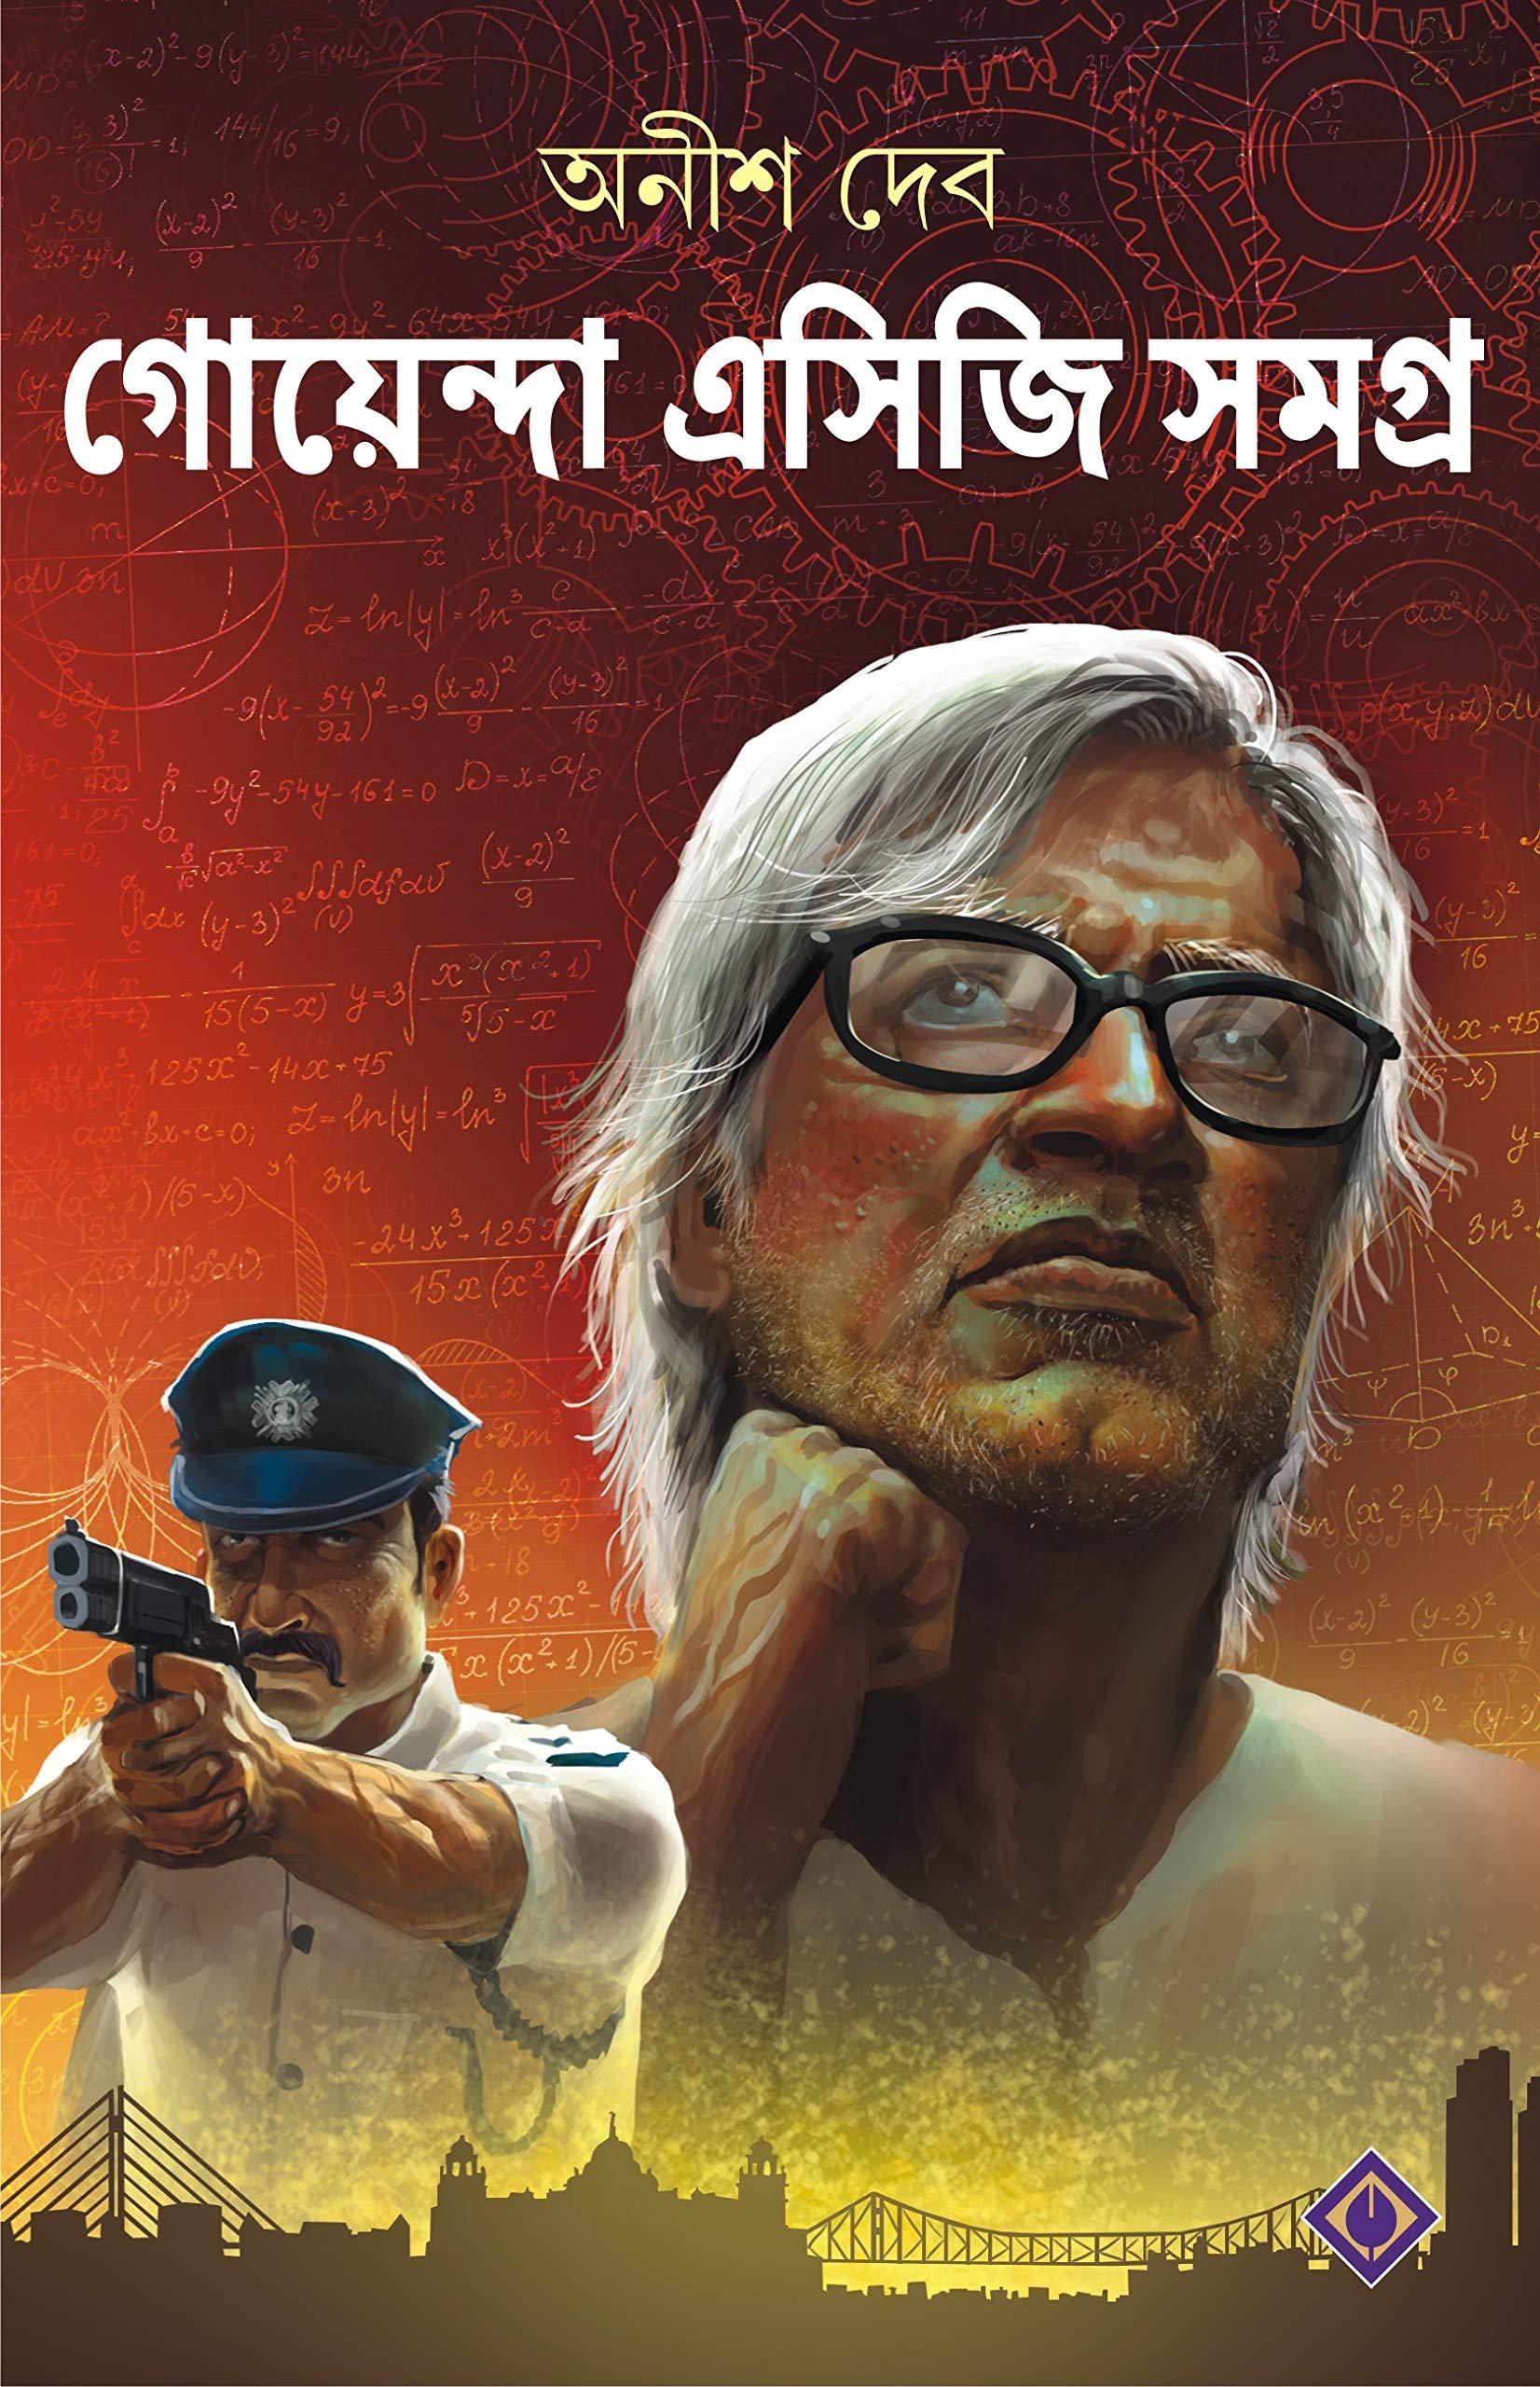 GOENDA ACG SAMAGRA | Bengali Detective Novels and Stories | Bangla Goenda Upanyas